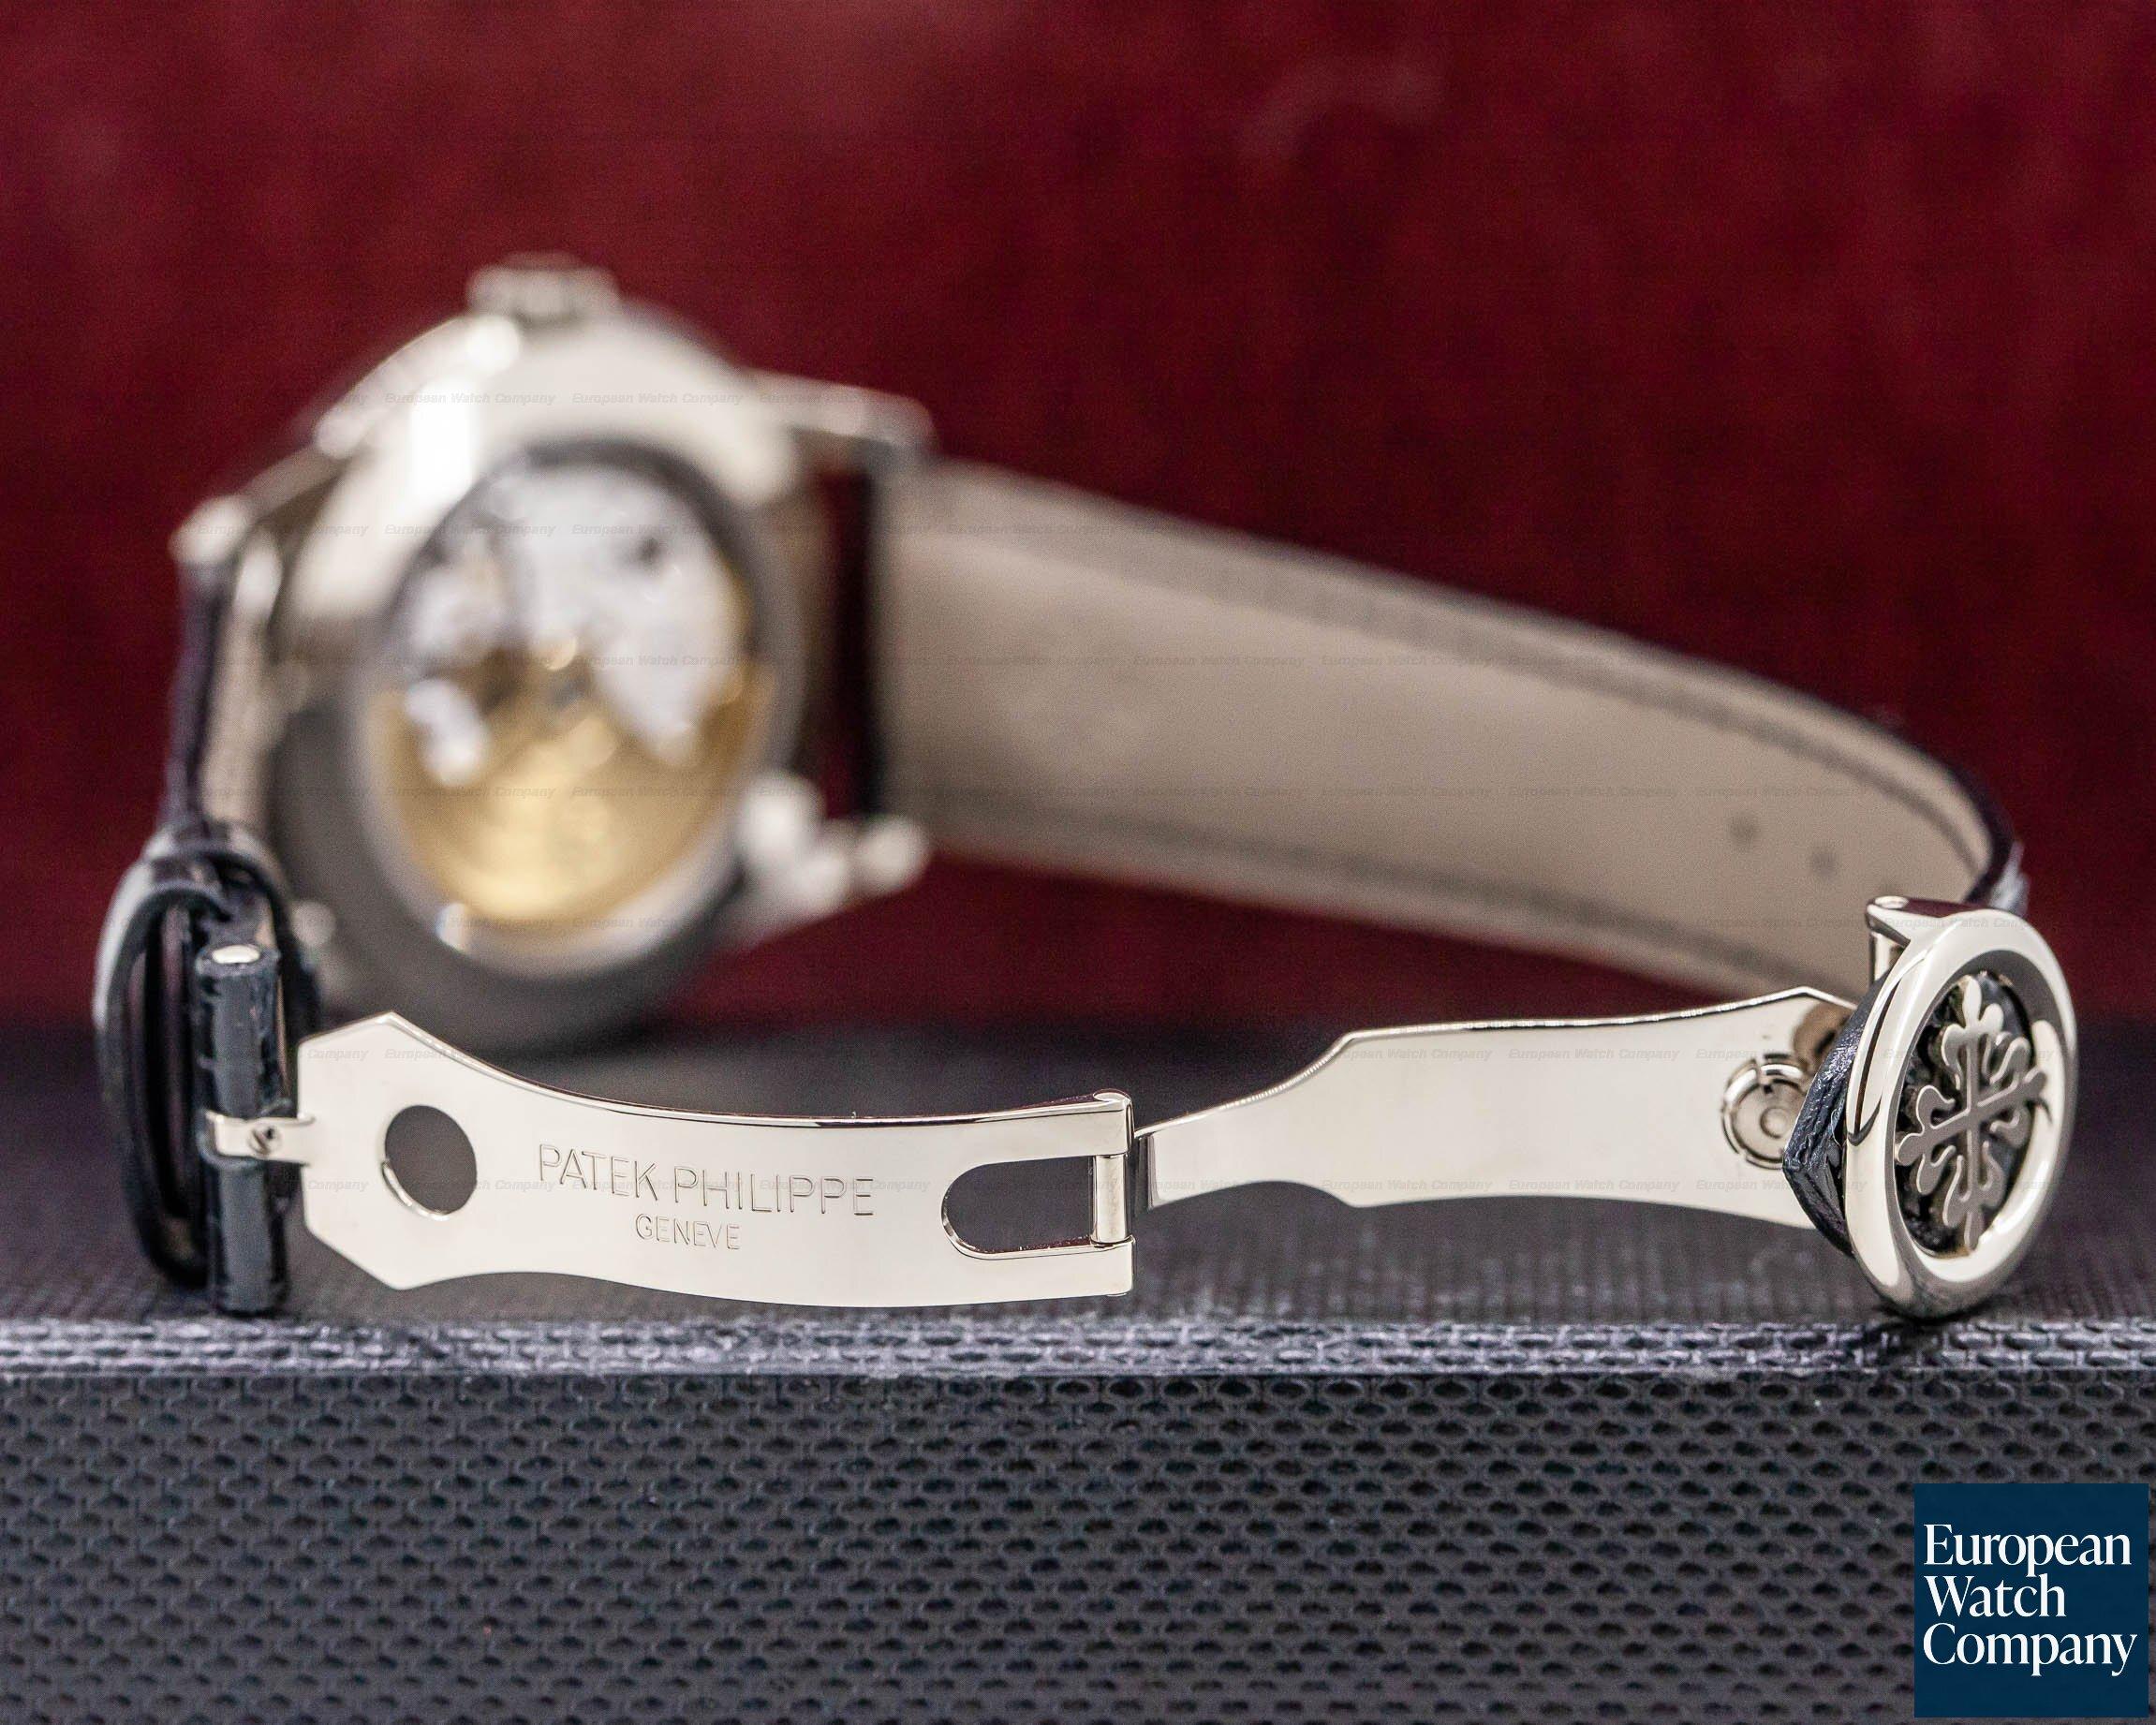 Patek Philippe 5320G-001 Perpetual Calendar Grand Complications 18K White Gold